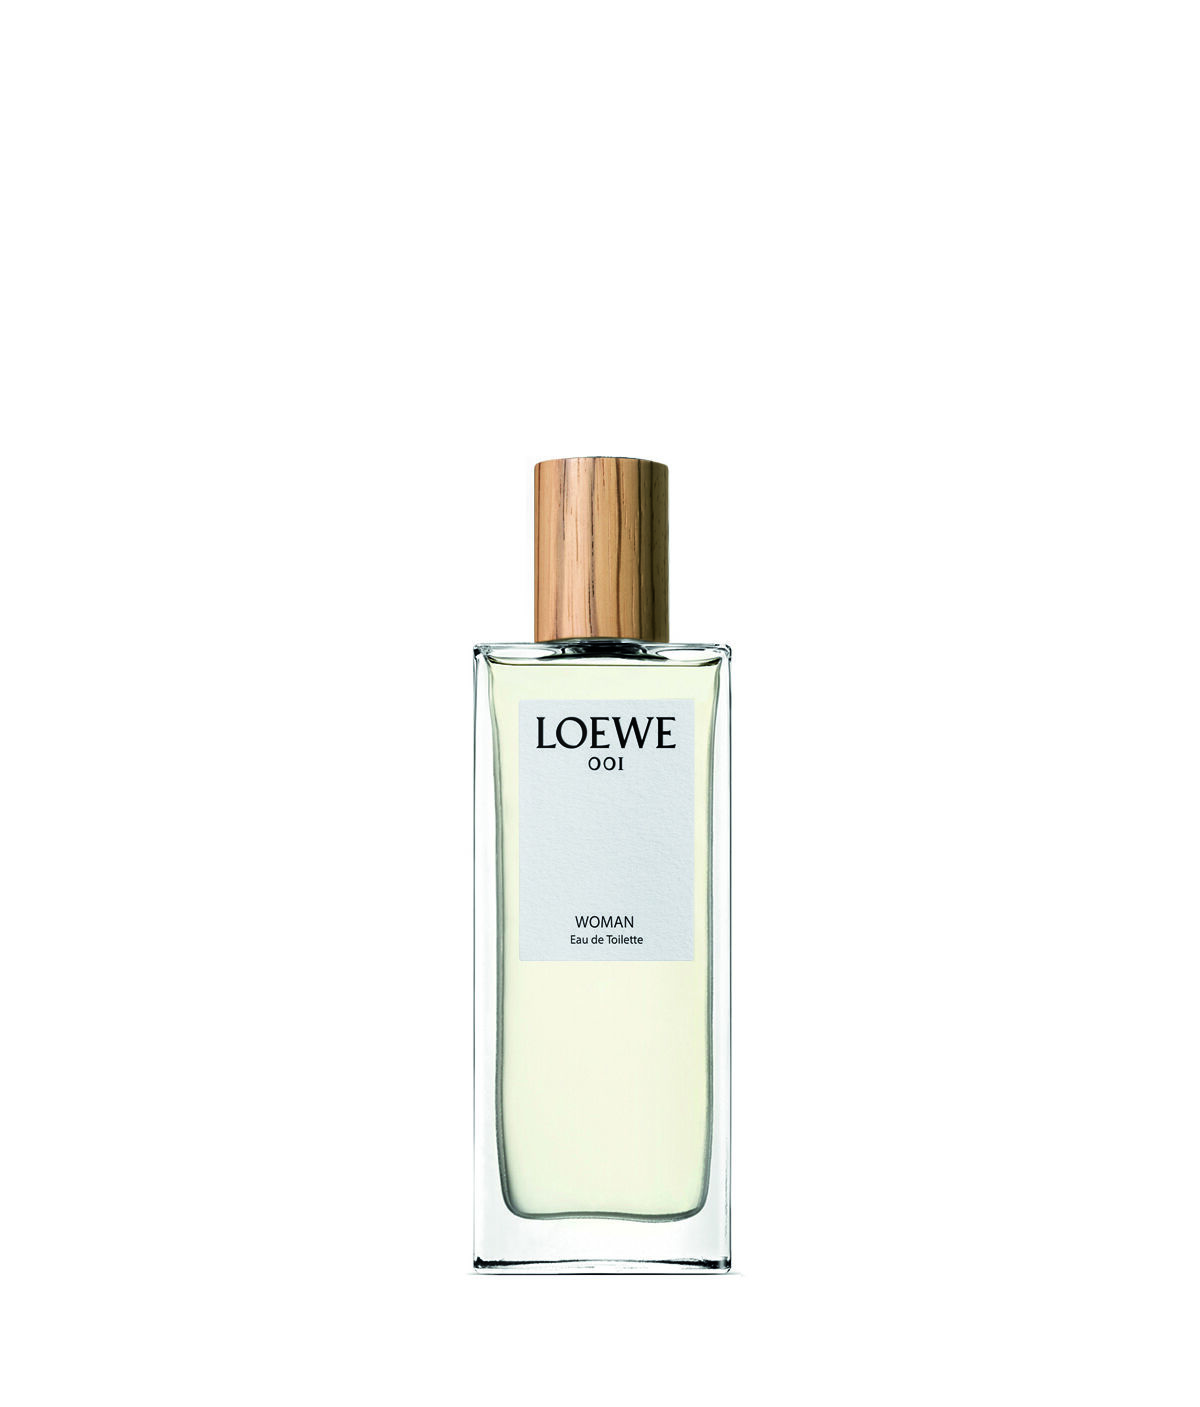 LOEWE Loewe 001 Woman Edt 50Ml colourless all